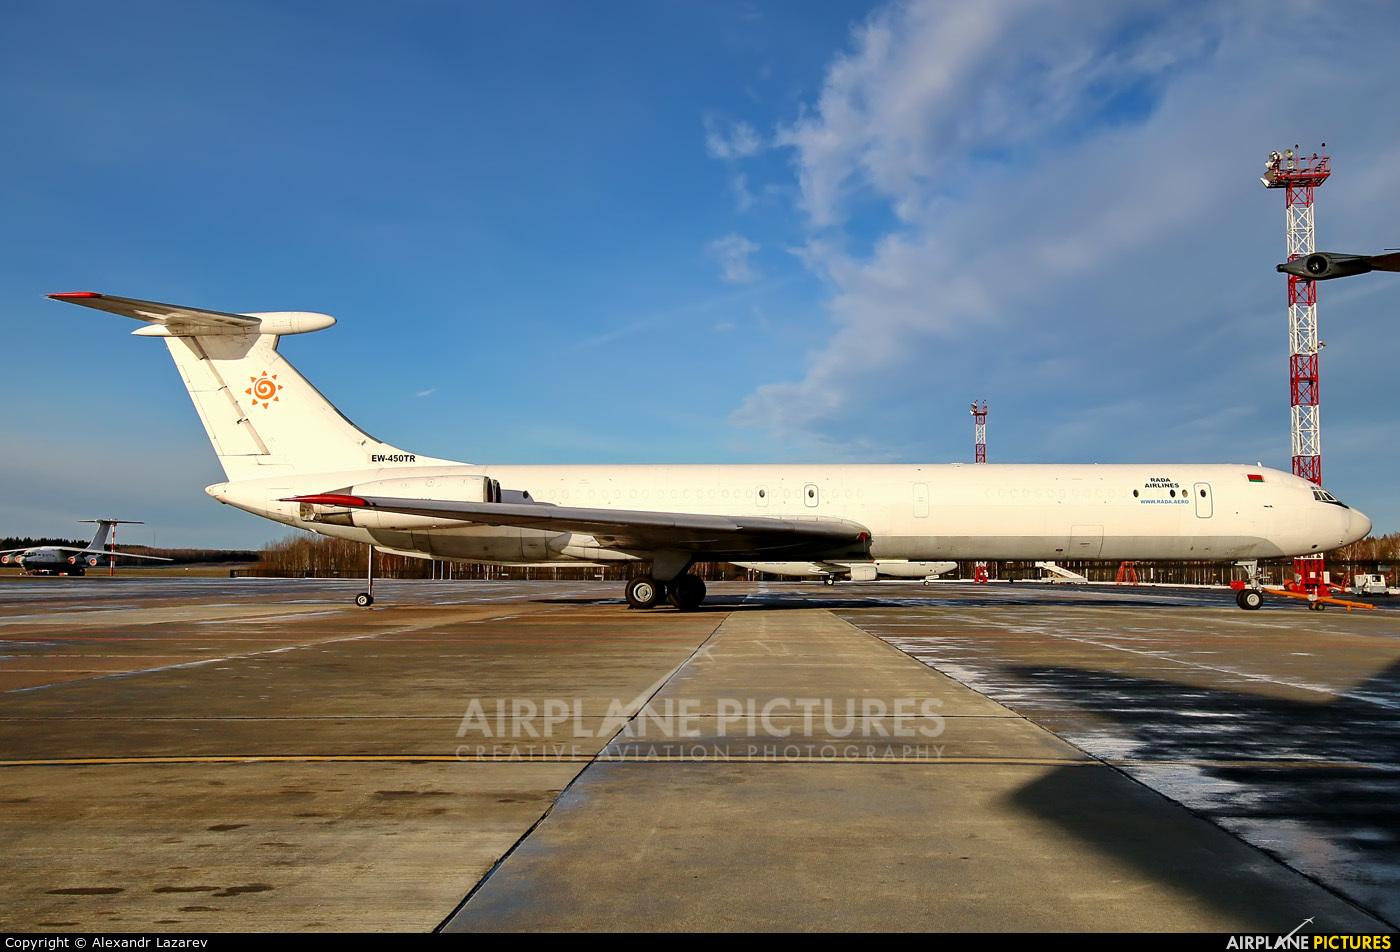 Rada Airlines EW-450TR aircraft at Minsk Intl